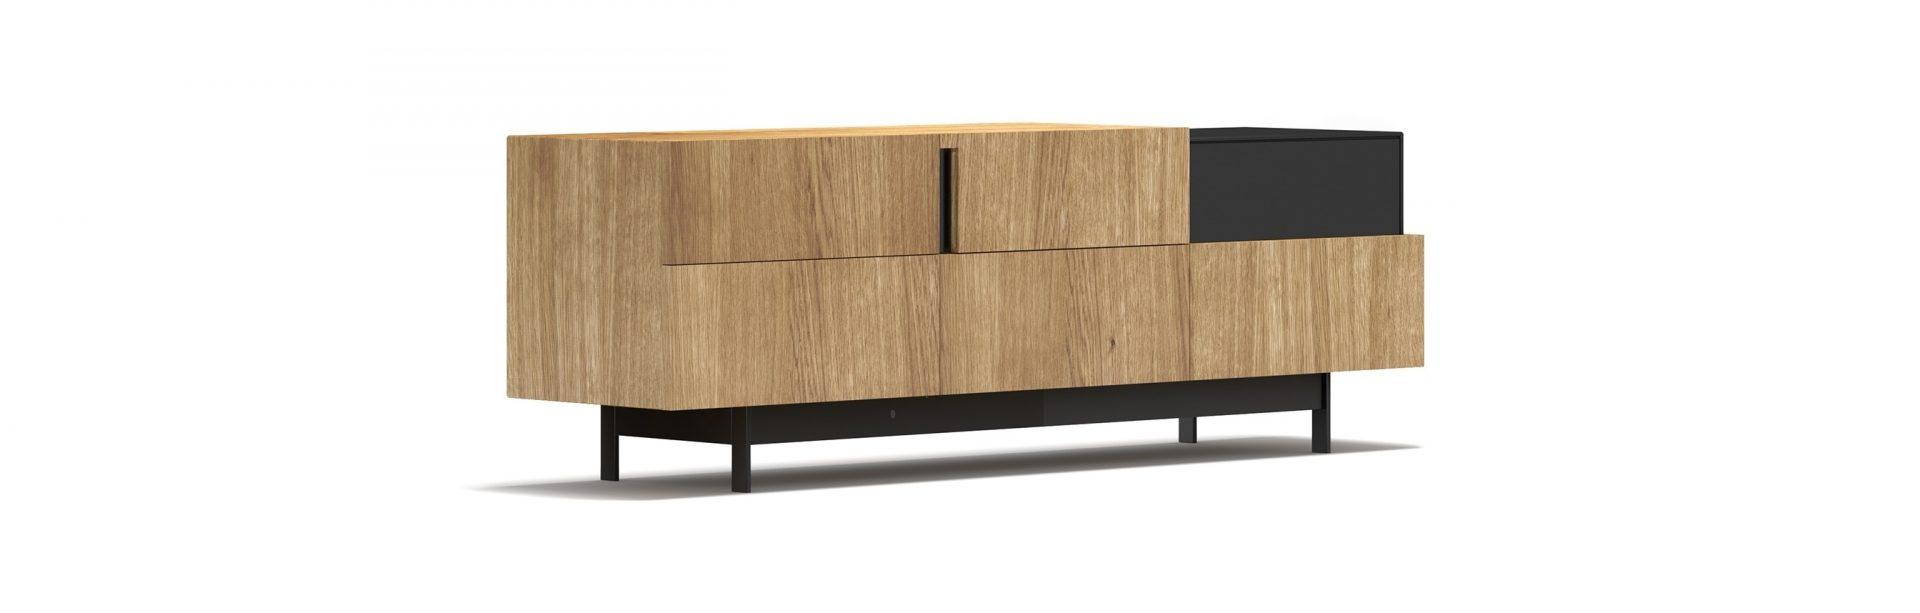 Oh Sofa - szafka TV Tetris 3